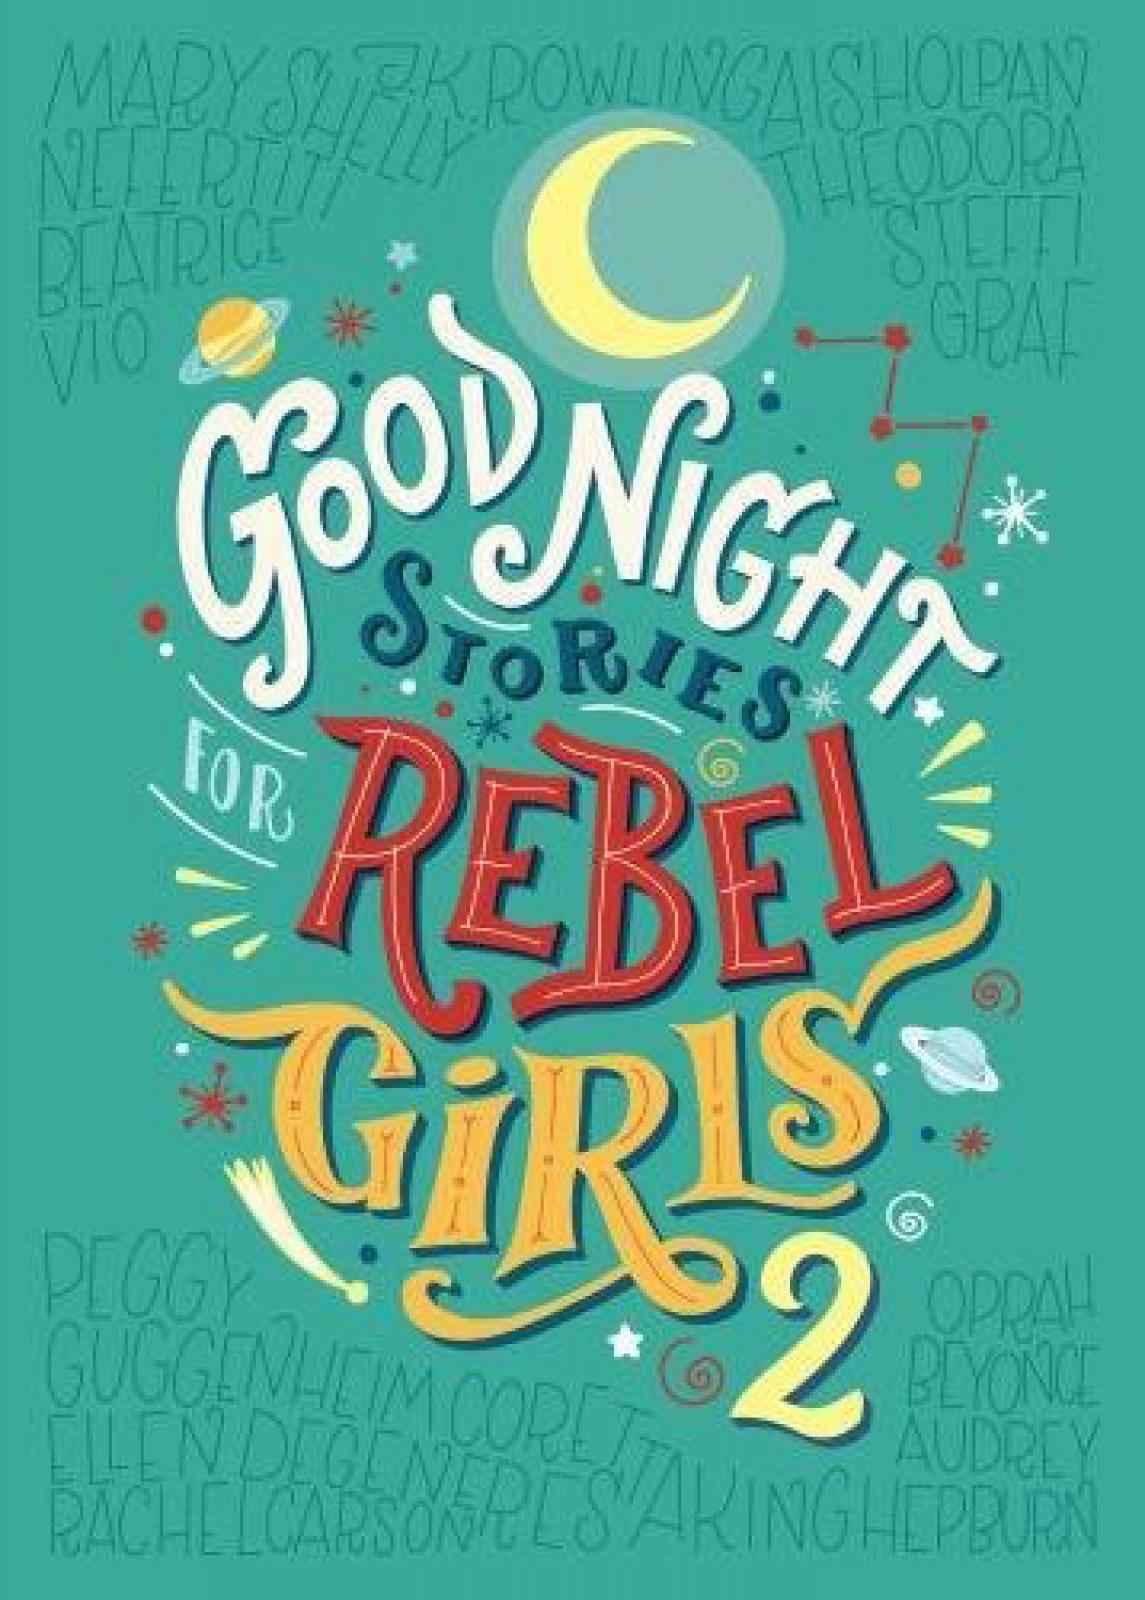 Goodnight Stories For Rebel Girls 2 - Hardback Book